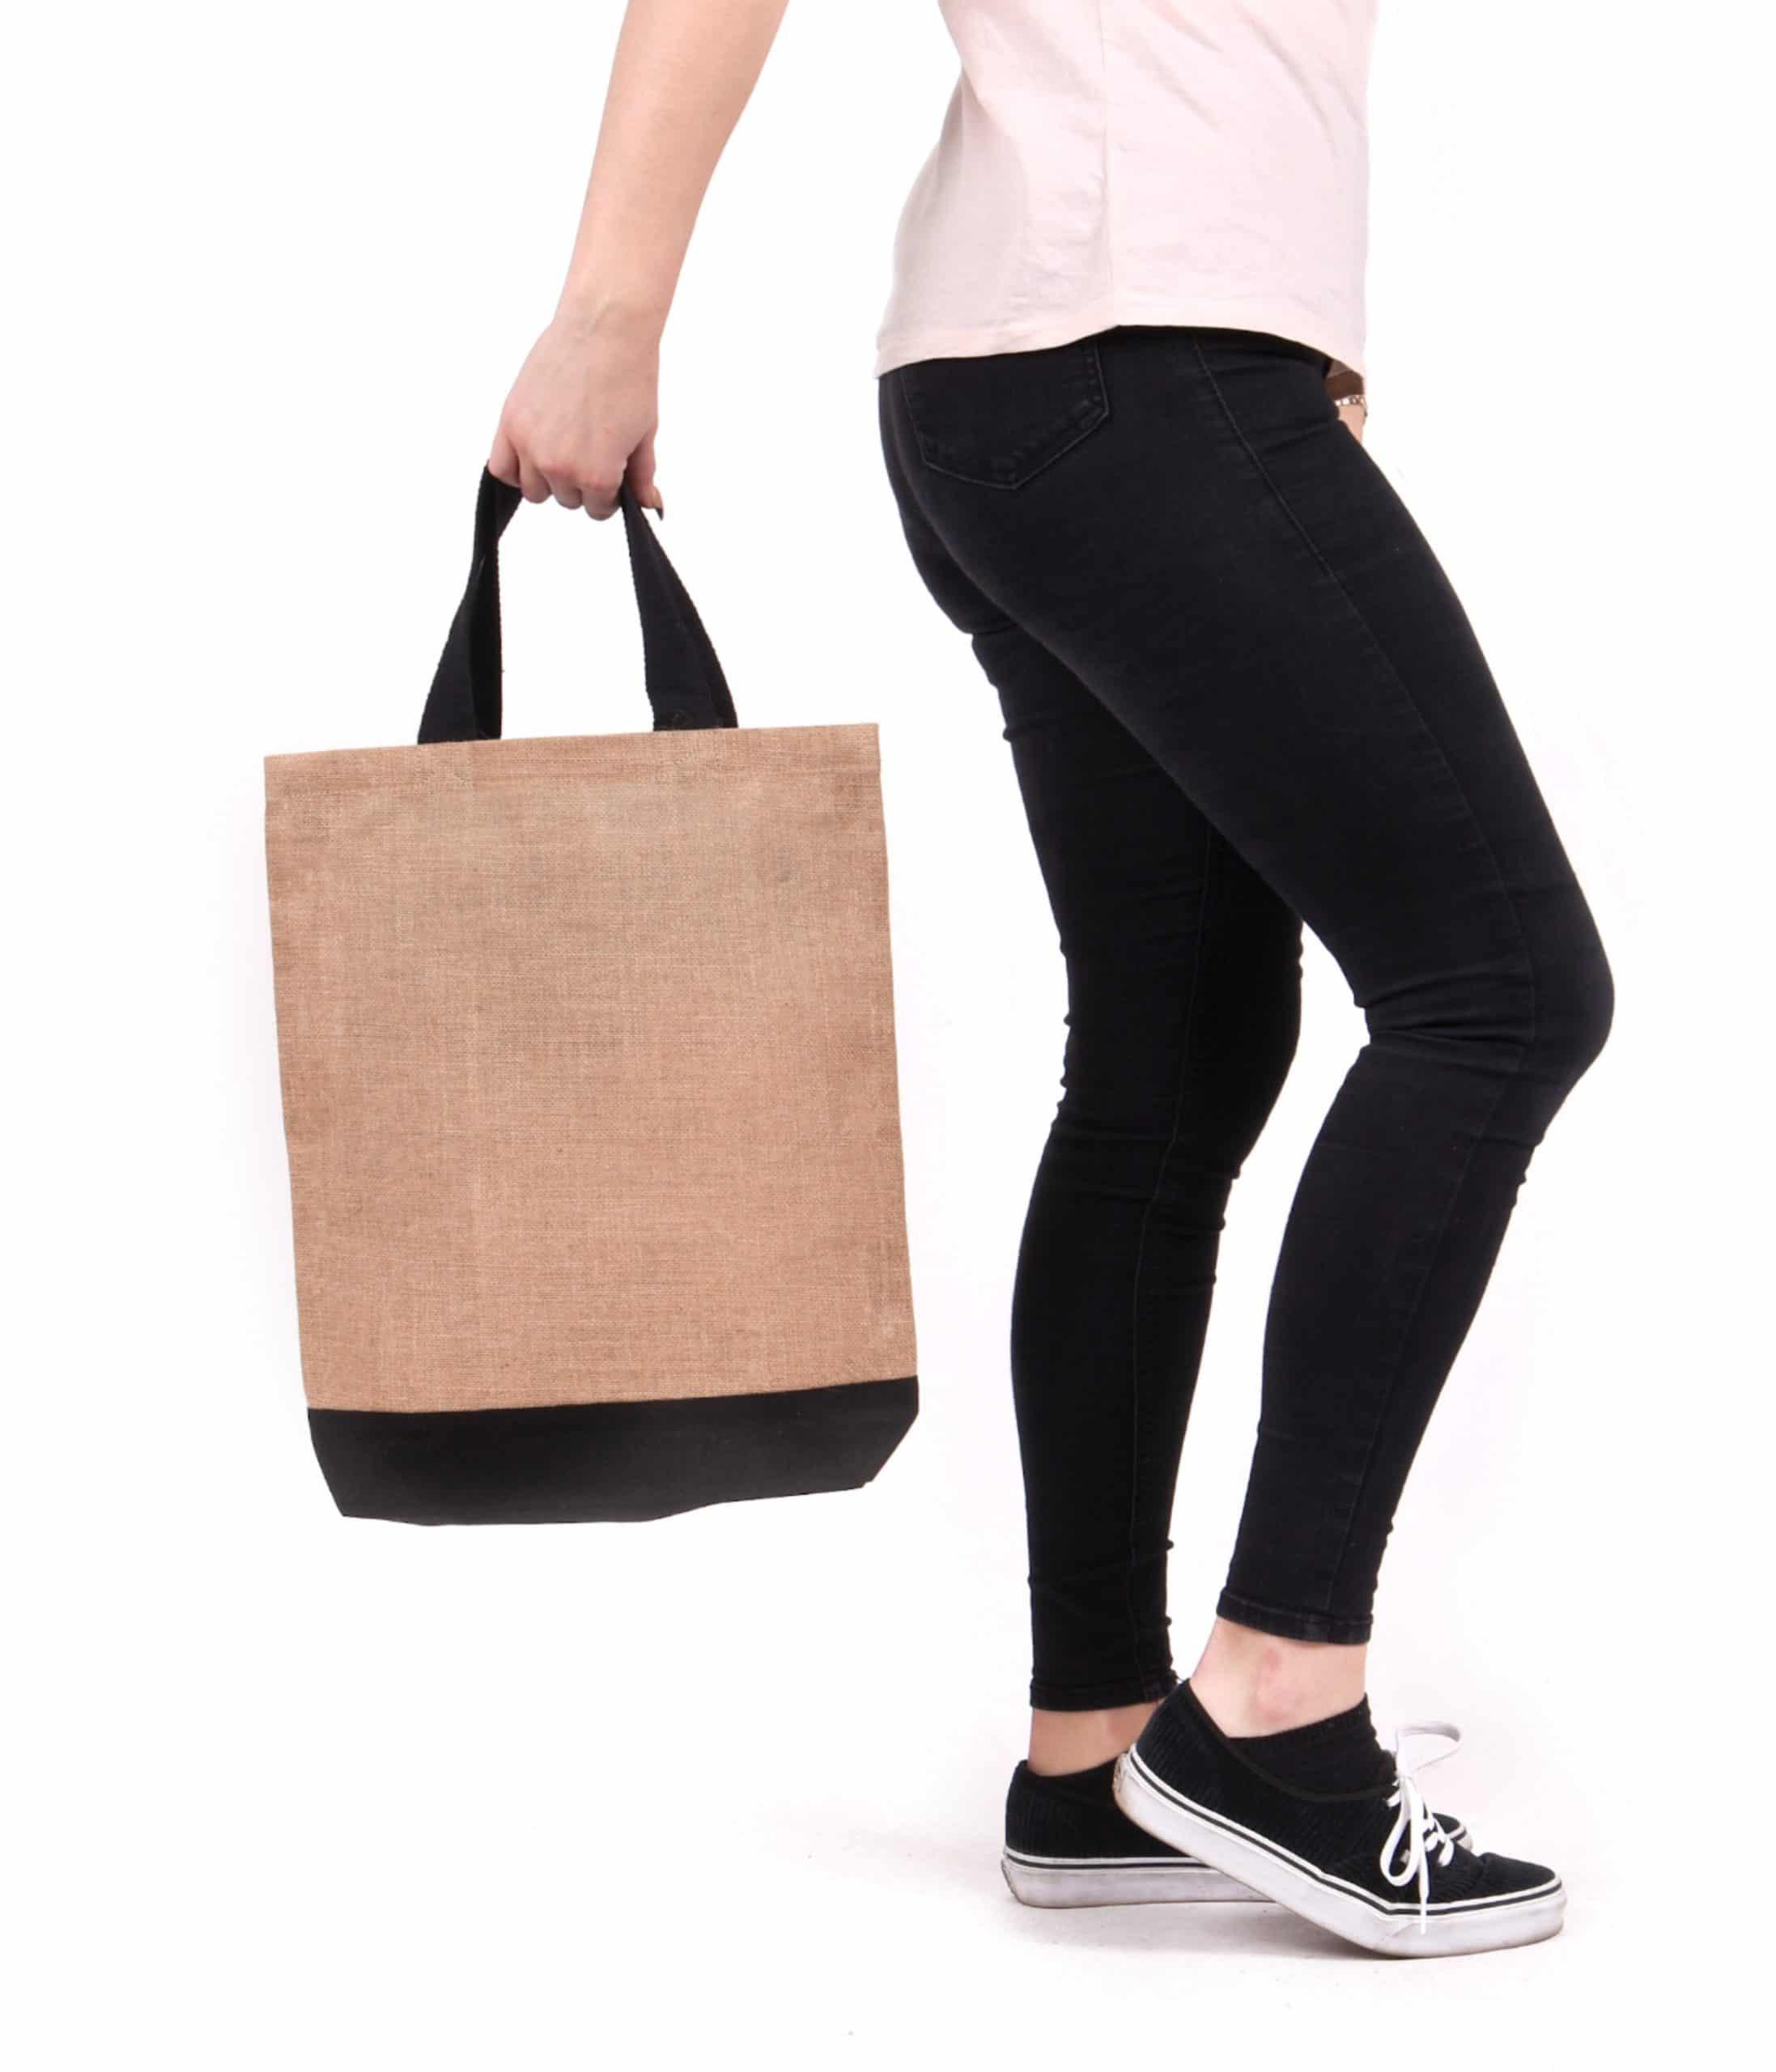 Contrast Jute Shopper